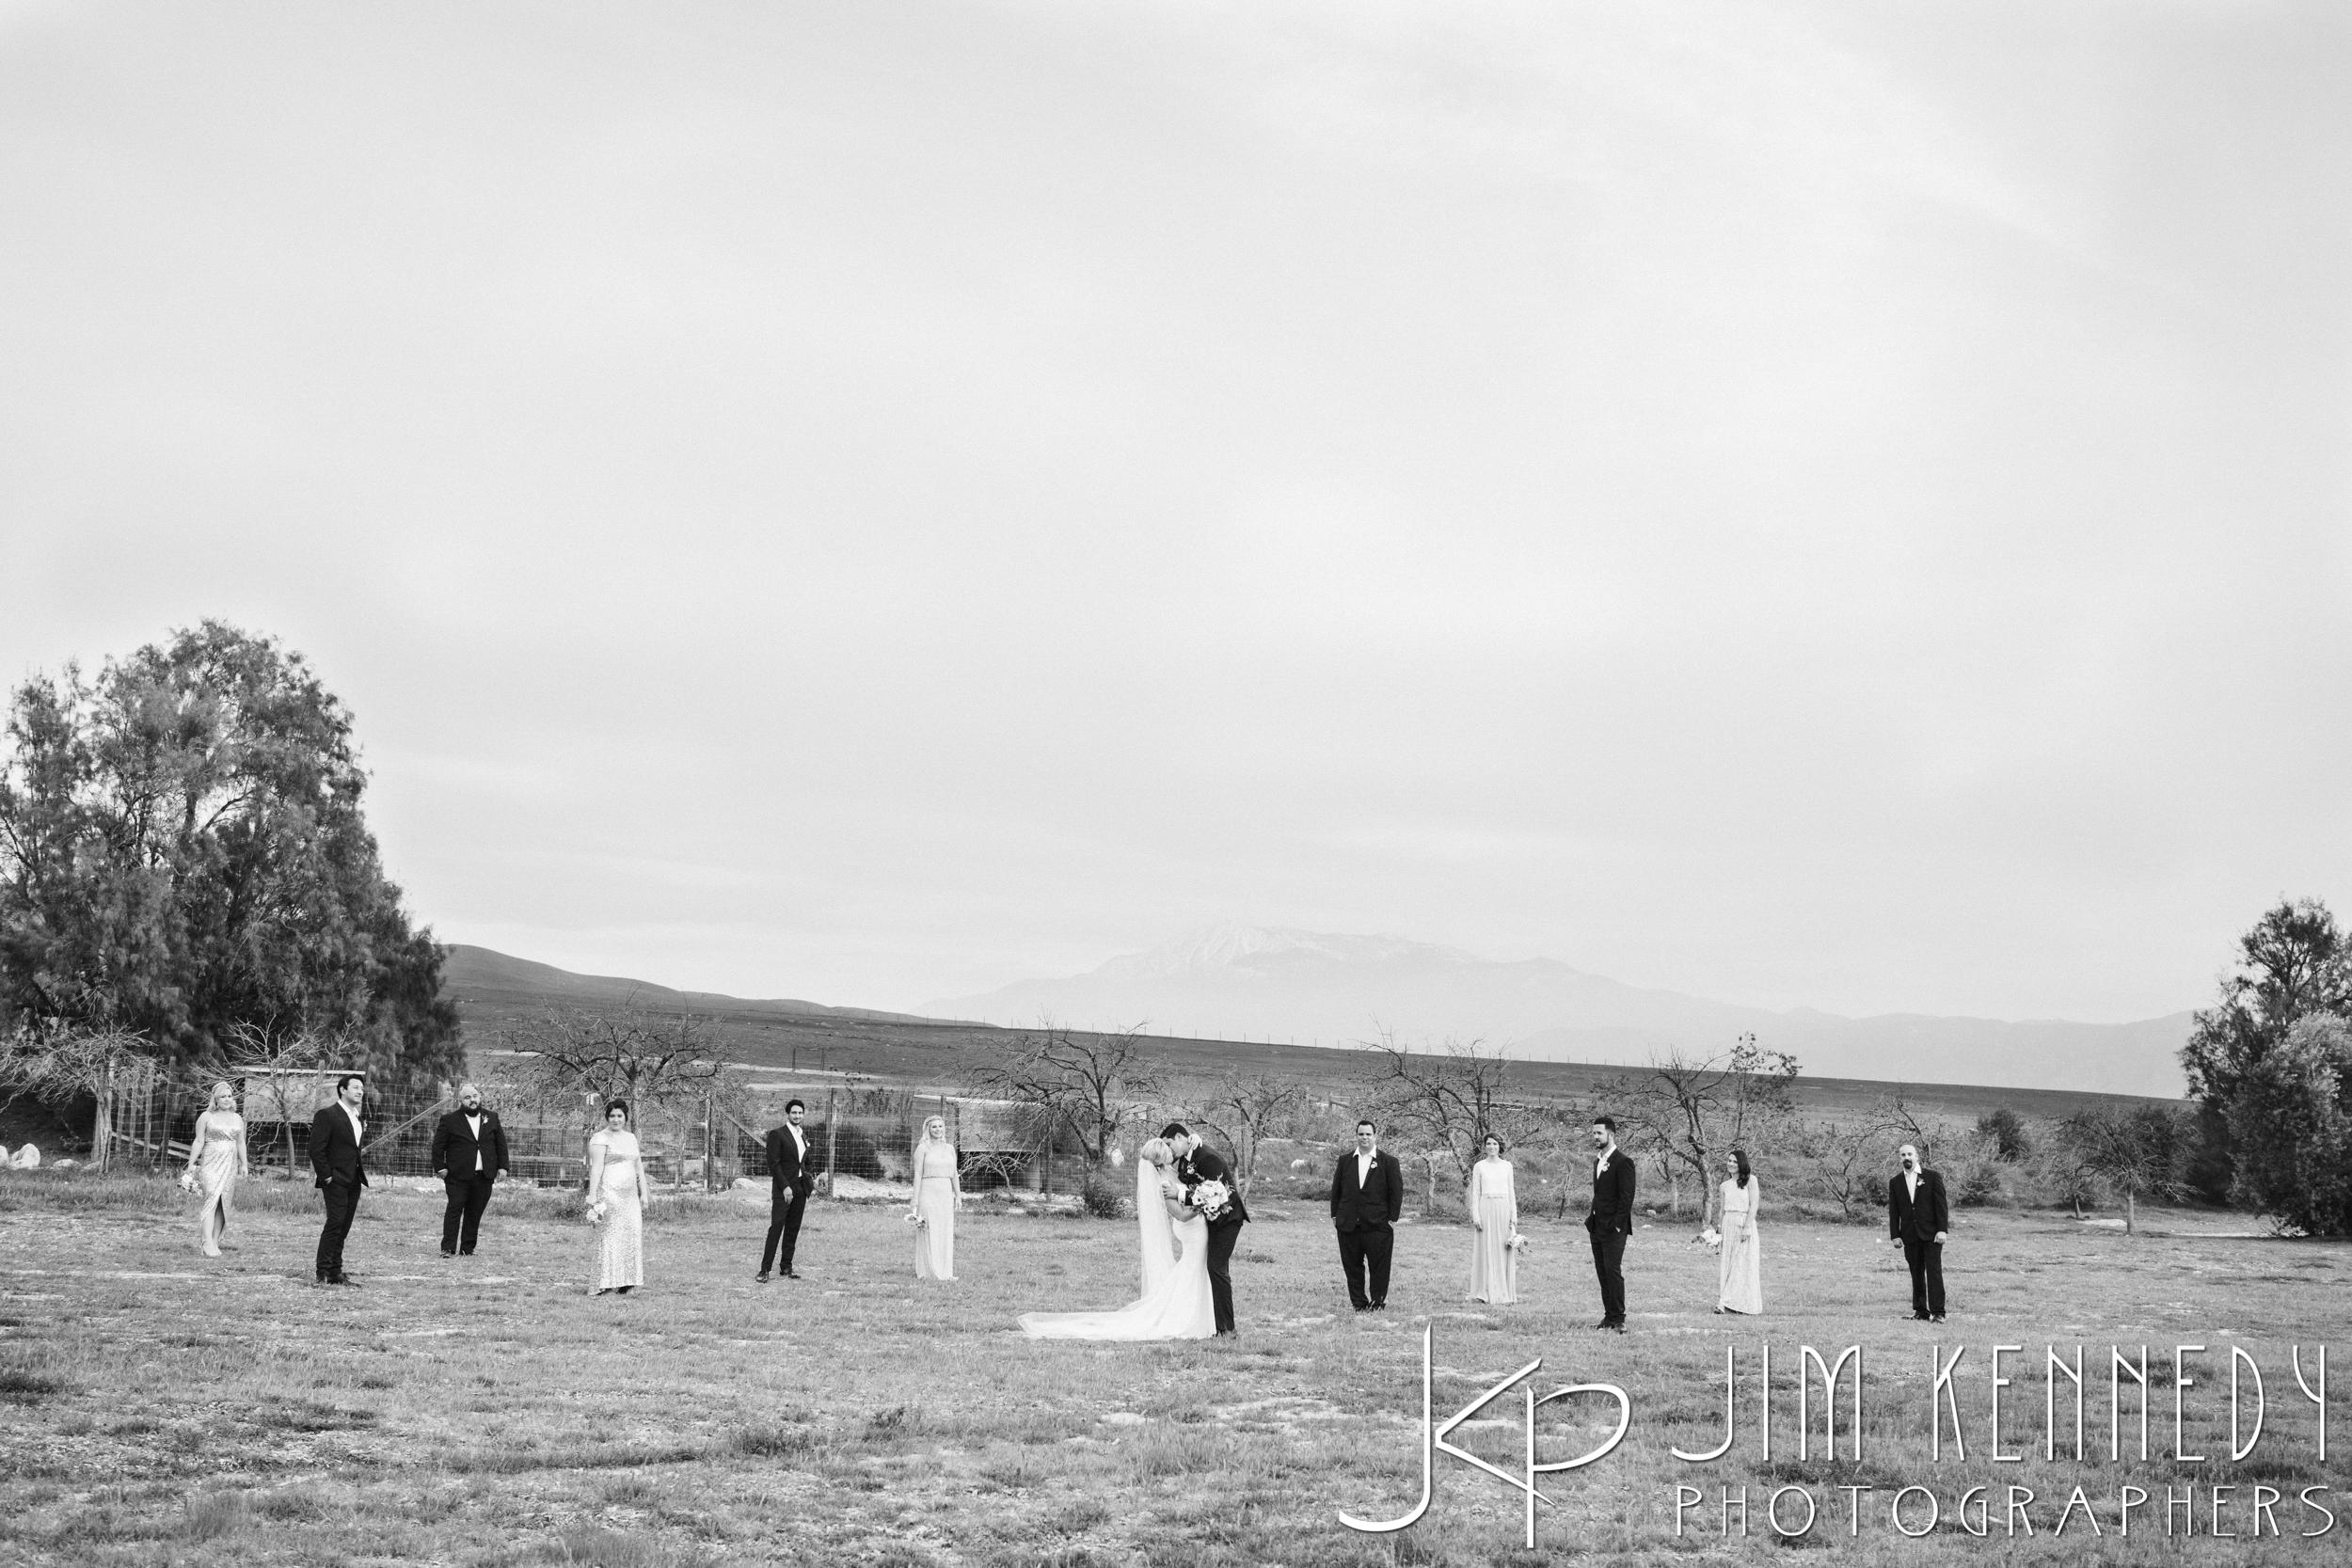 jim_kennedy_photographers_highland_springs_wedding_caitlyn_0132.jpg